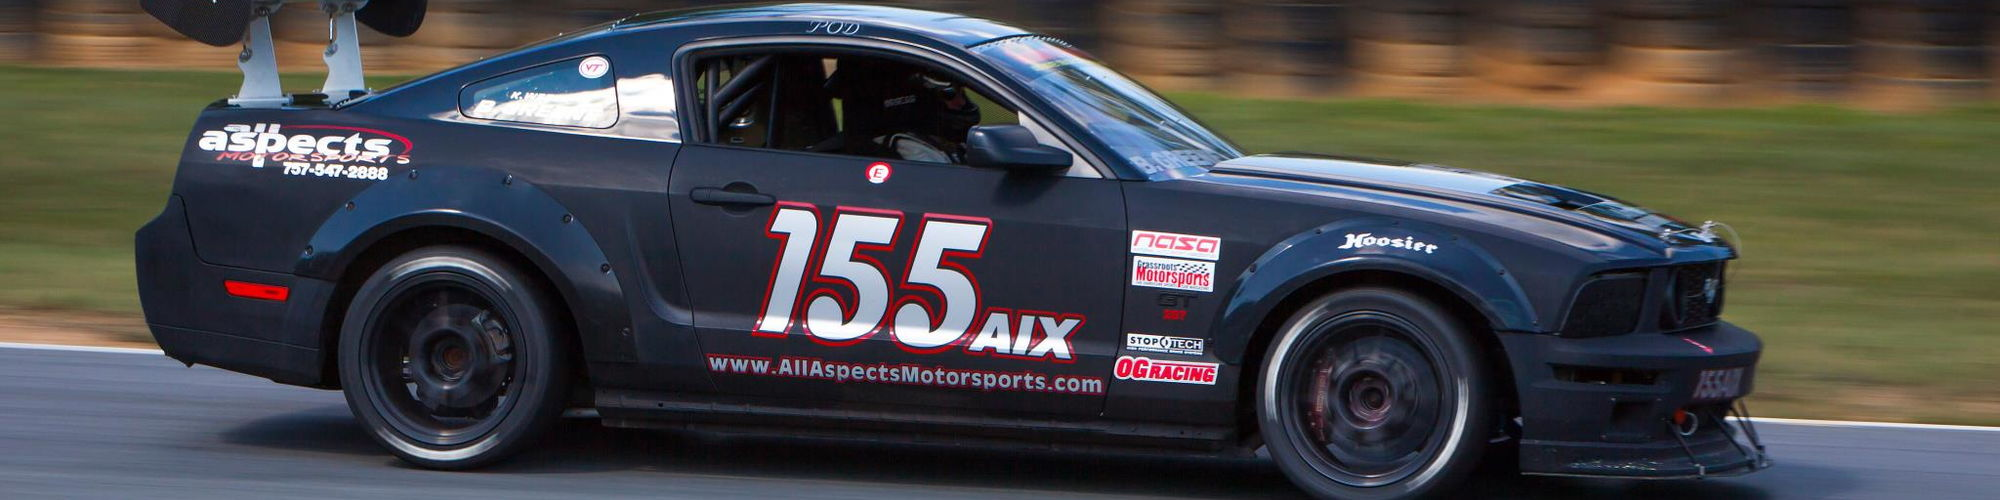 All Aspects Motorsports